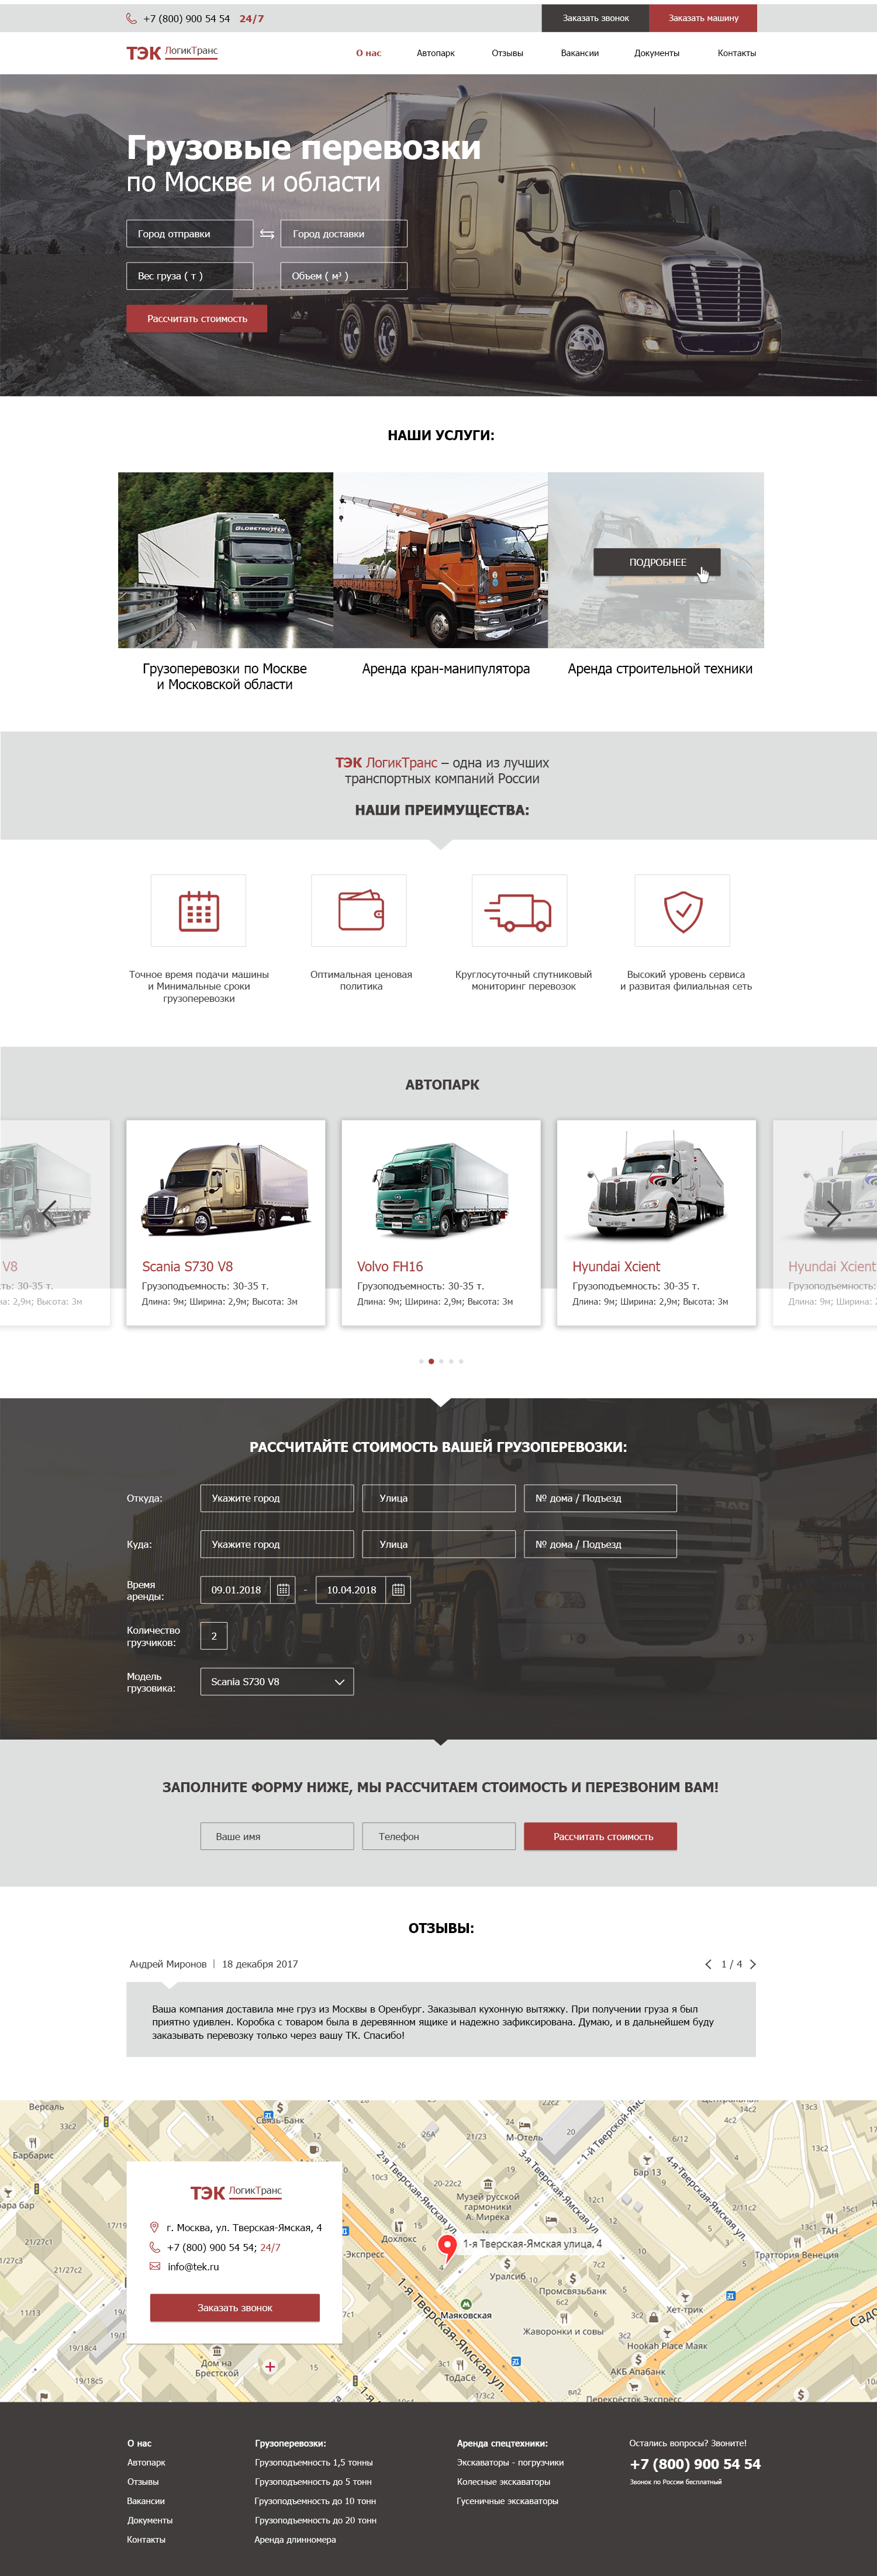 Дизайн сайта транспортно-экспедиторской компании ЛогикТранс фото f_9435a4541467fc8a.jpg